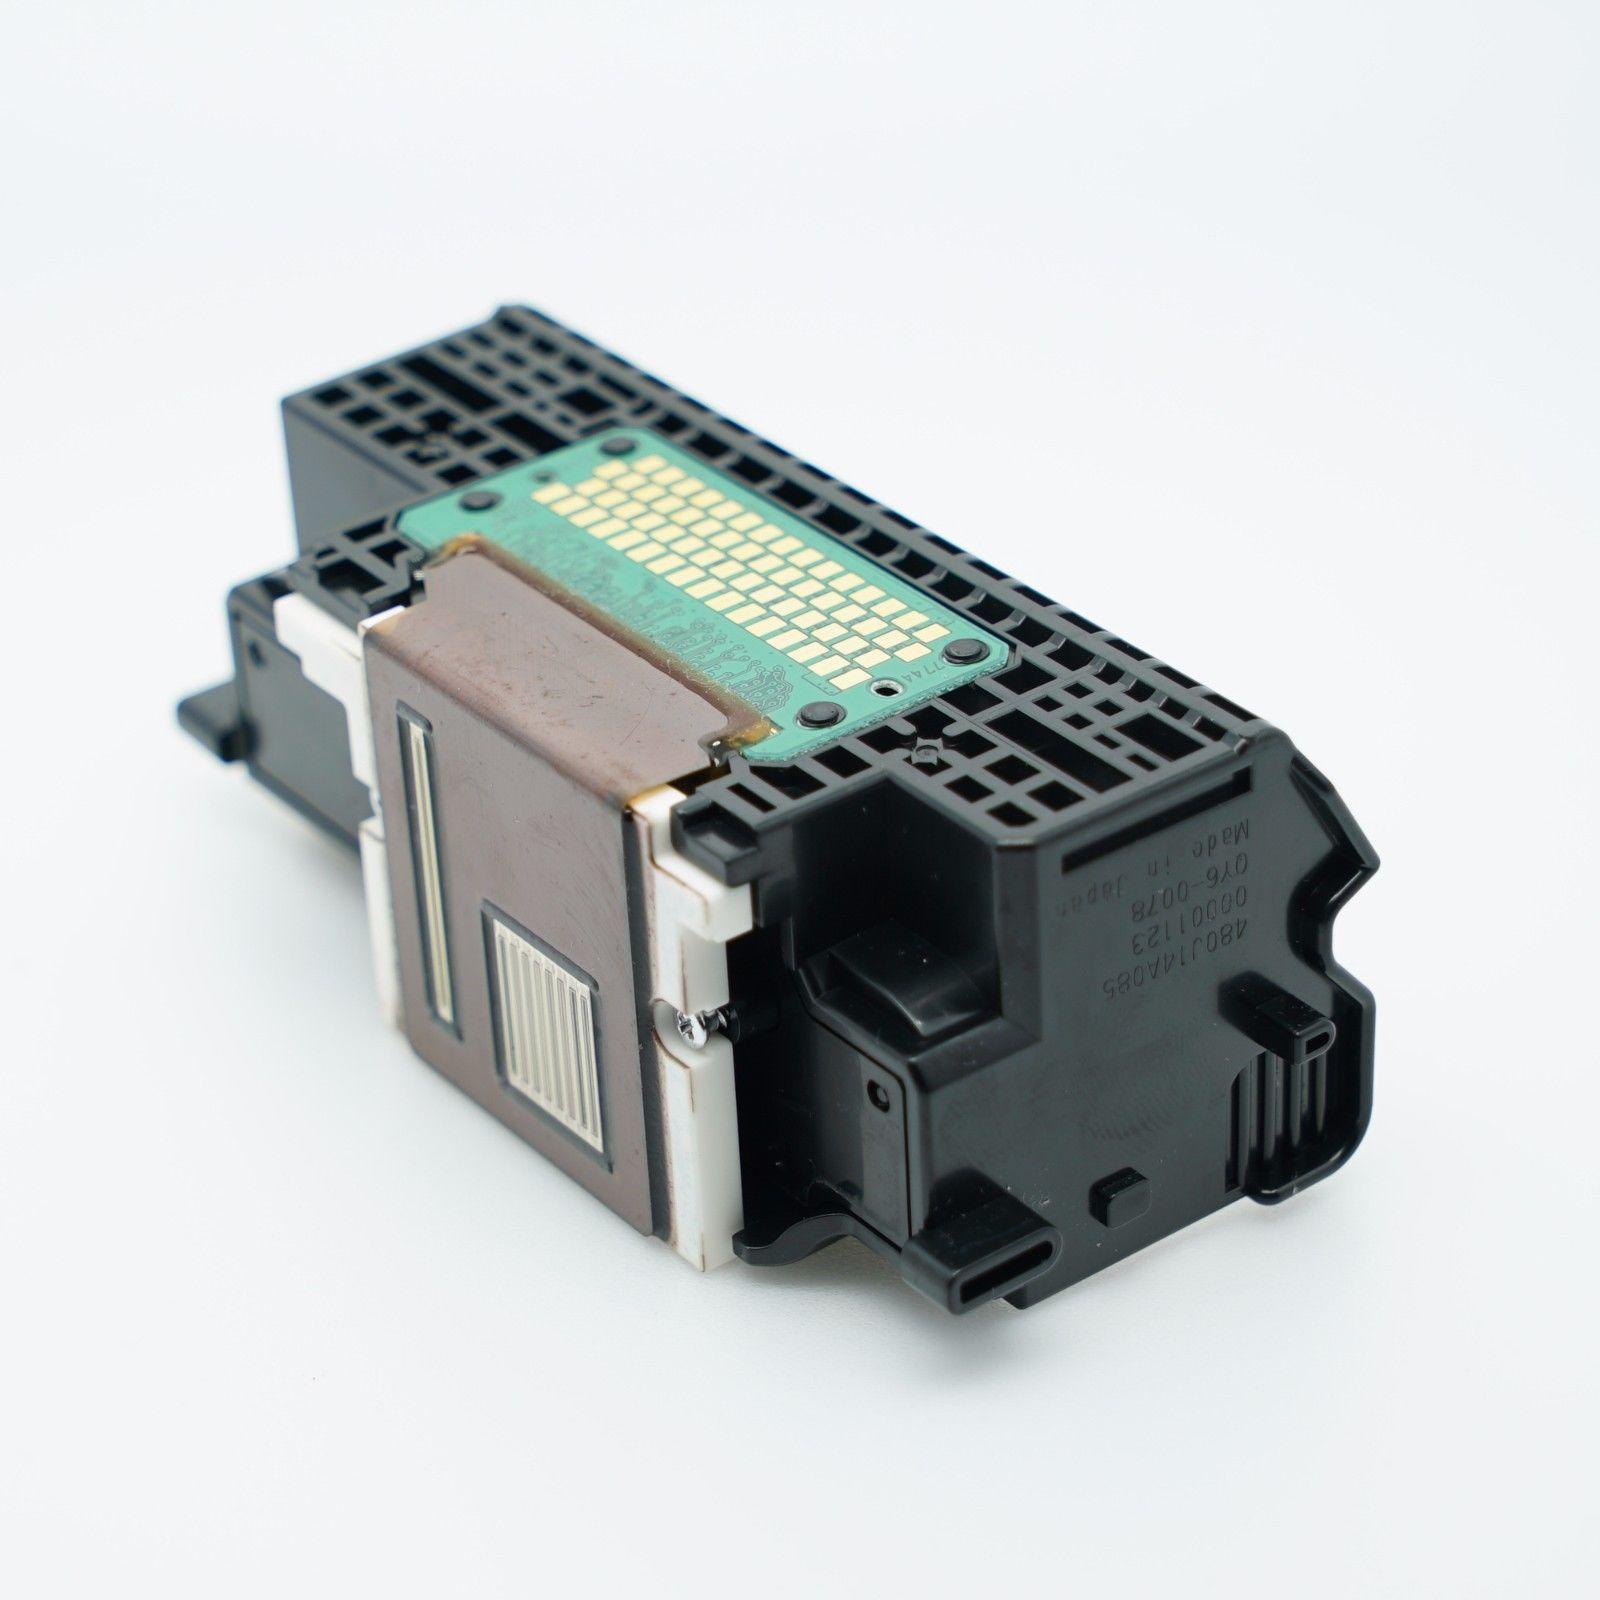 QY6-0078 печатающая головка для Canon MP990 MP996 MG6120 MG6140 MG6180 MG6280 MG8120 mg6110 mg8150